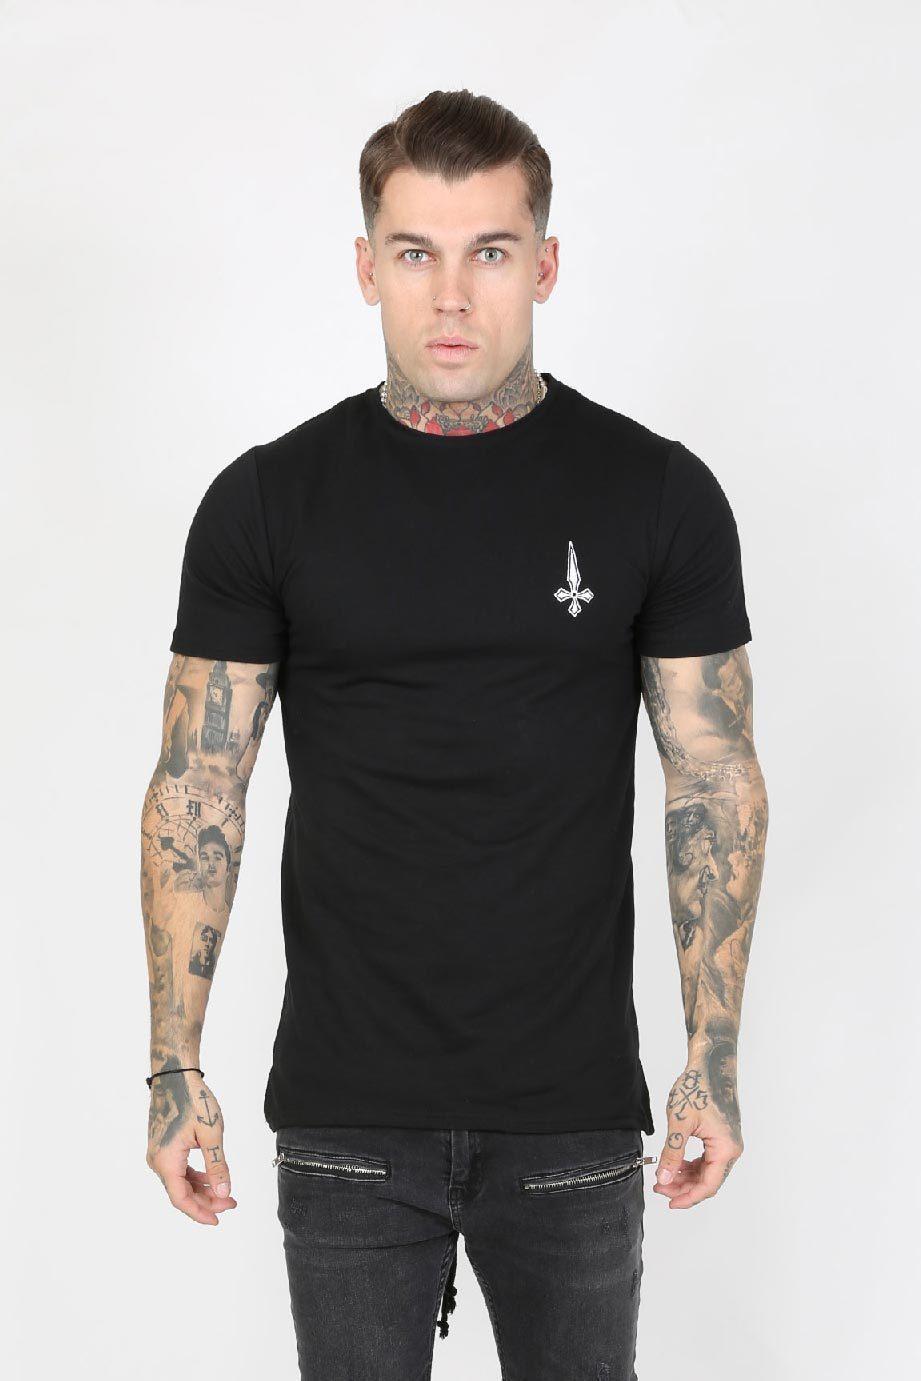 Parka Hem Men's T-Shirt - Black, Small